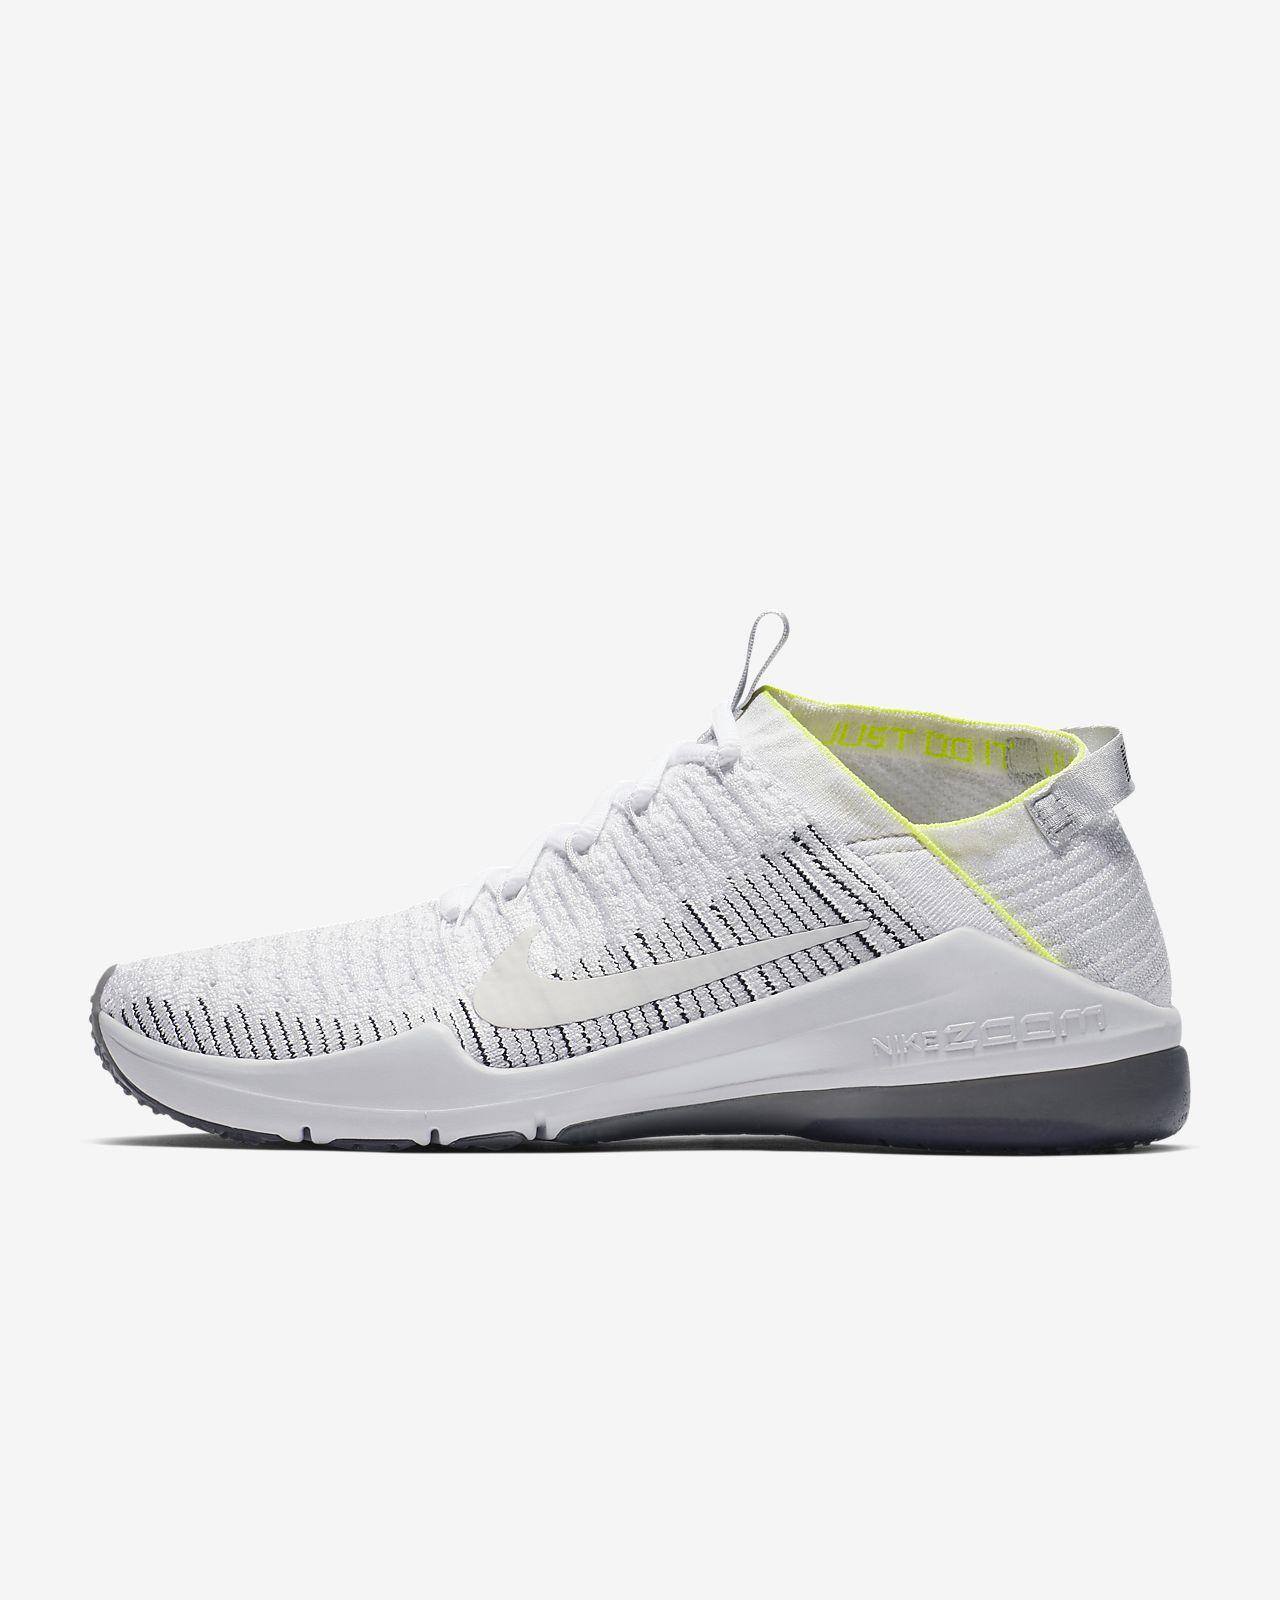 pretty nice 385b6 b7e10 ... Nike Air Zoom Fearless Flyknit 2 Damenschuh für  Fitnessstudio Training Boxen